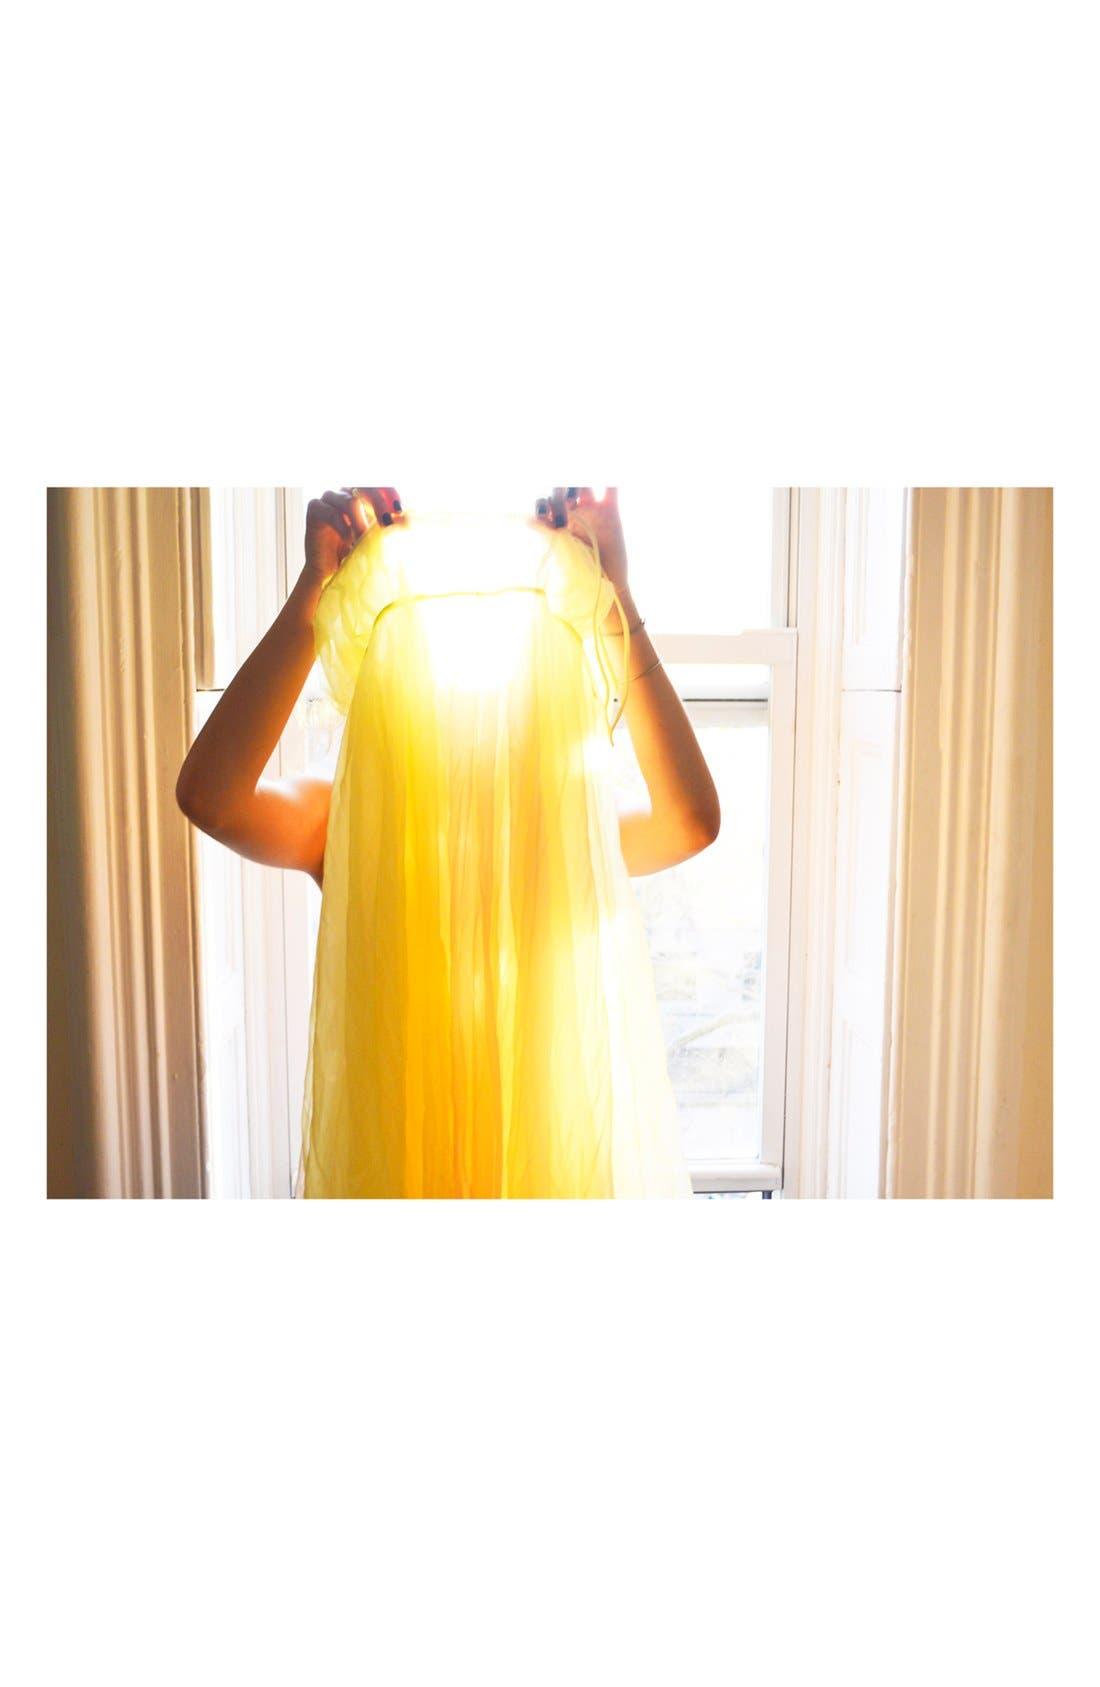 Main Image - She Hit Pause Studios 'Yellow Dress' Wall Art